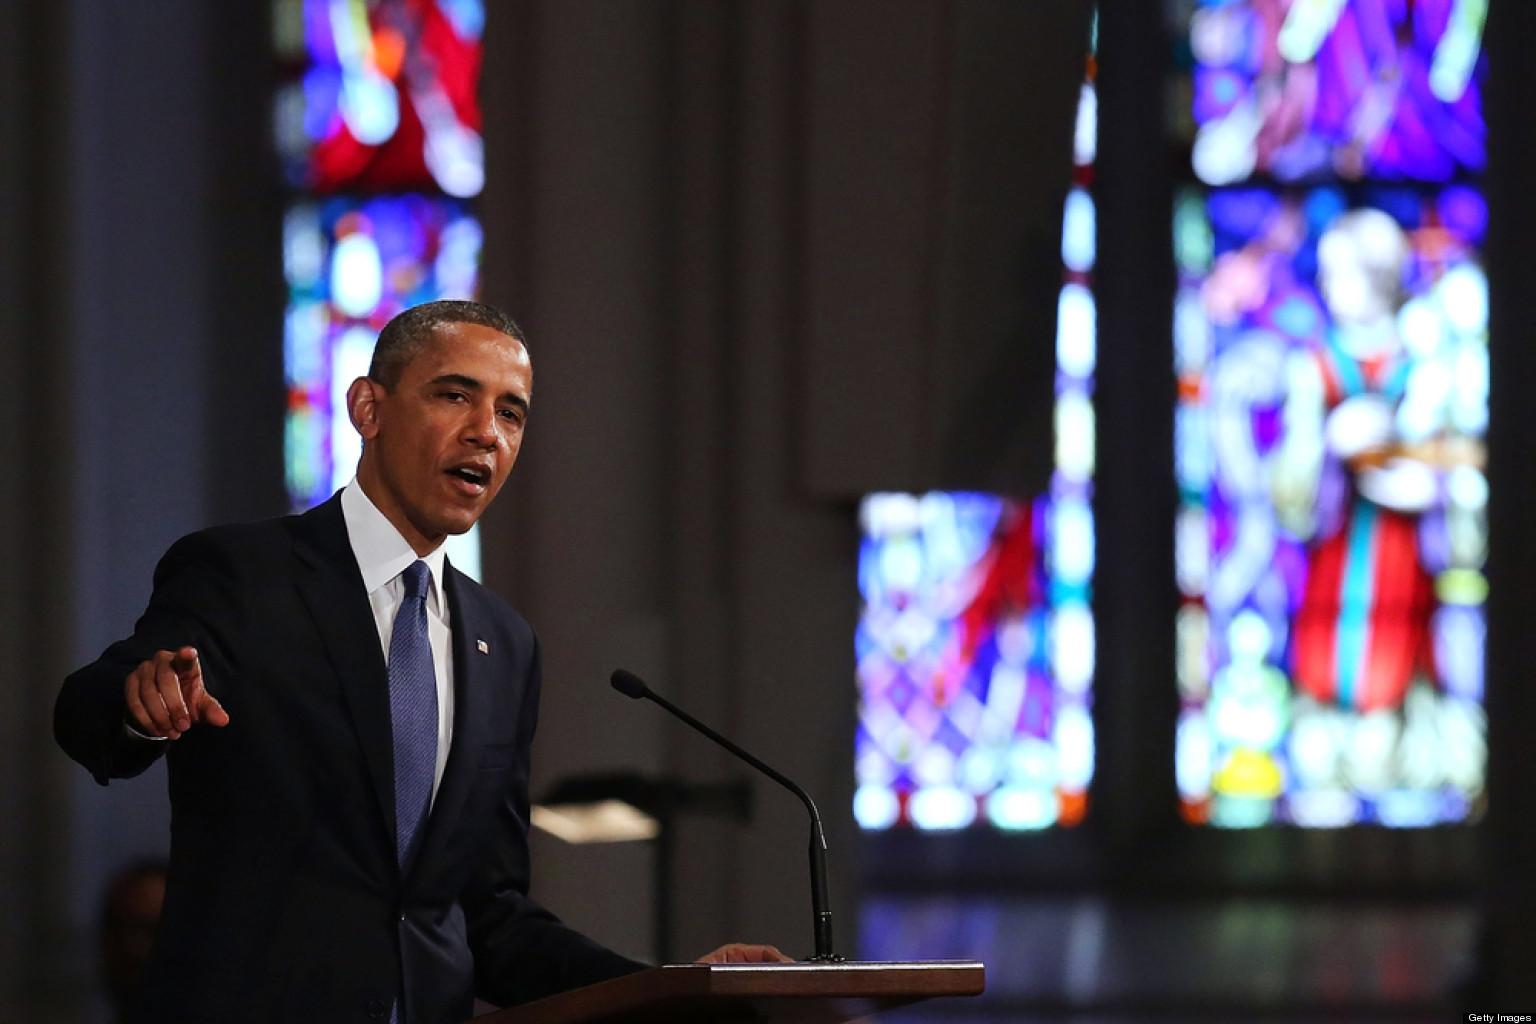 Full Text Of President Obama's Address At Boston Interfaith Service